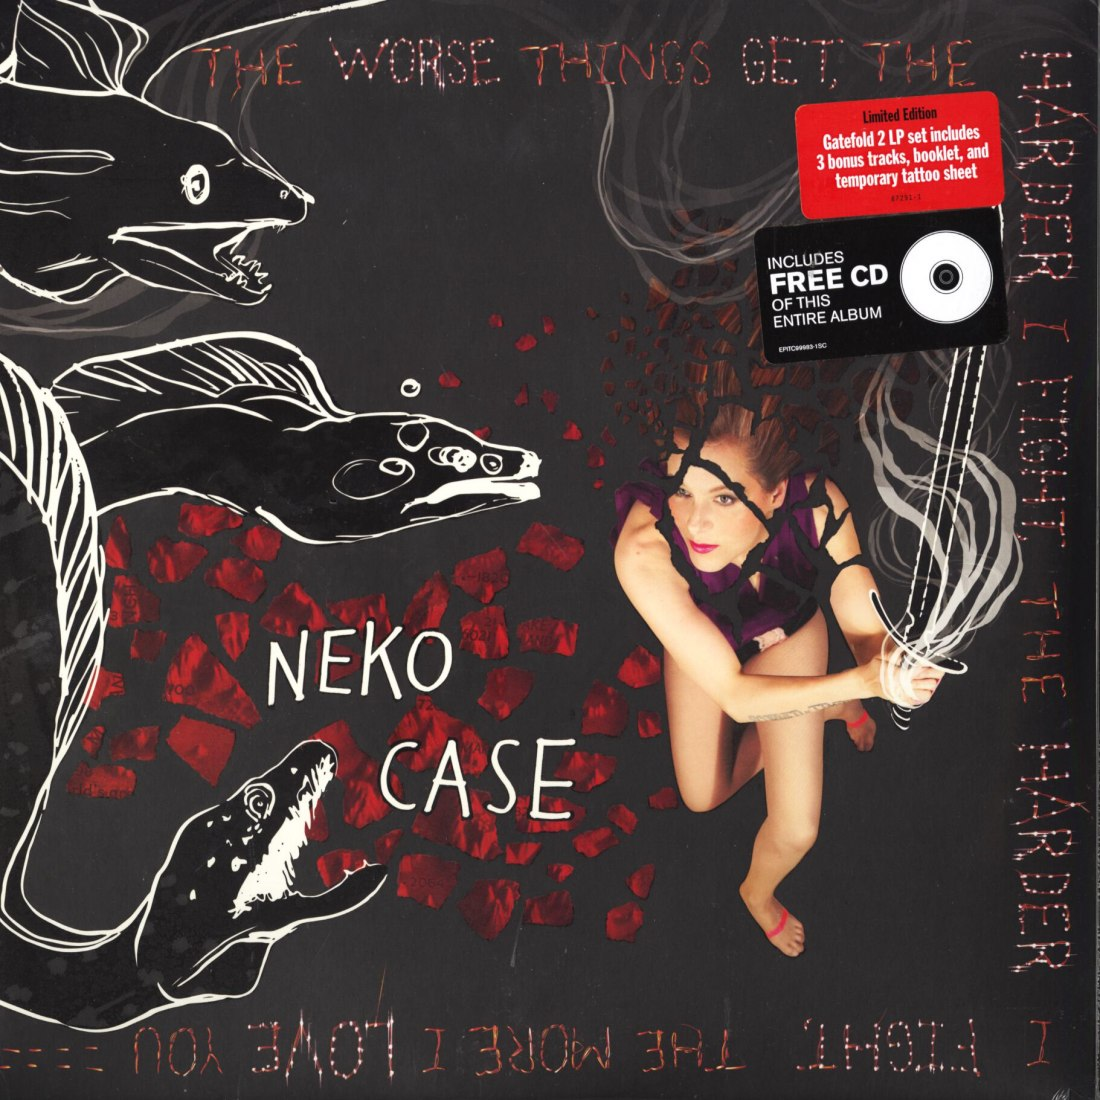 Neko Case - The Worse Things Get... - Deluxe, 2XLP, Vinyl, CD w bonus tracks, Anti, 2013